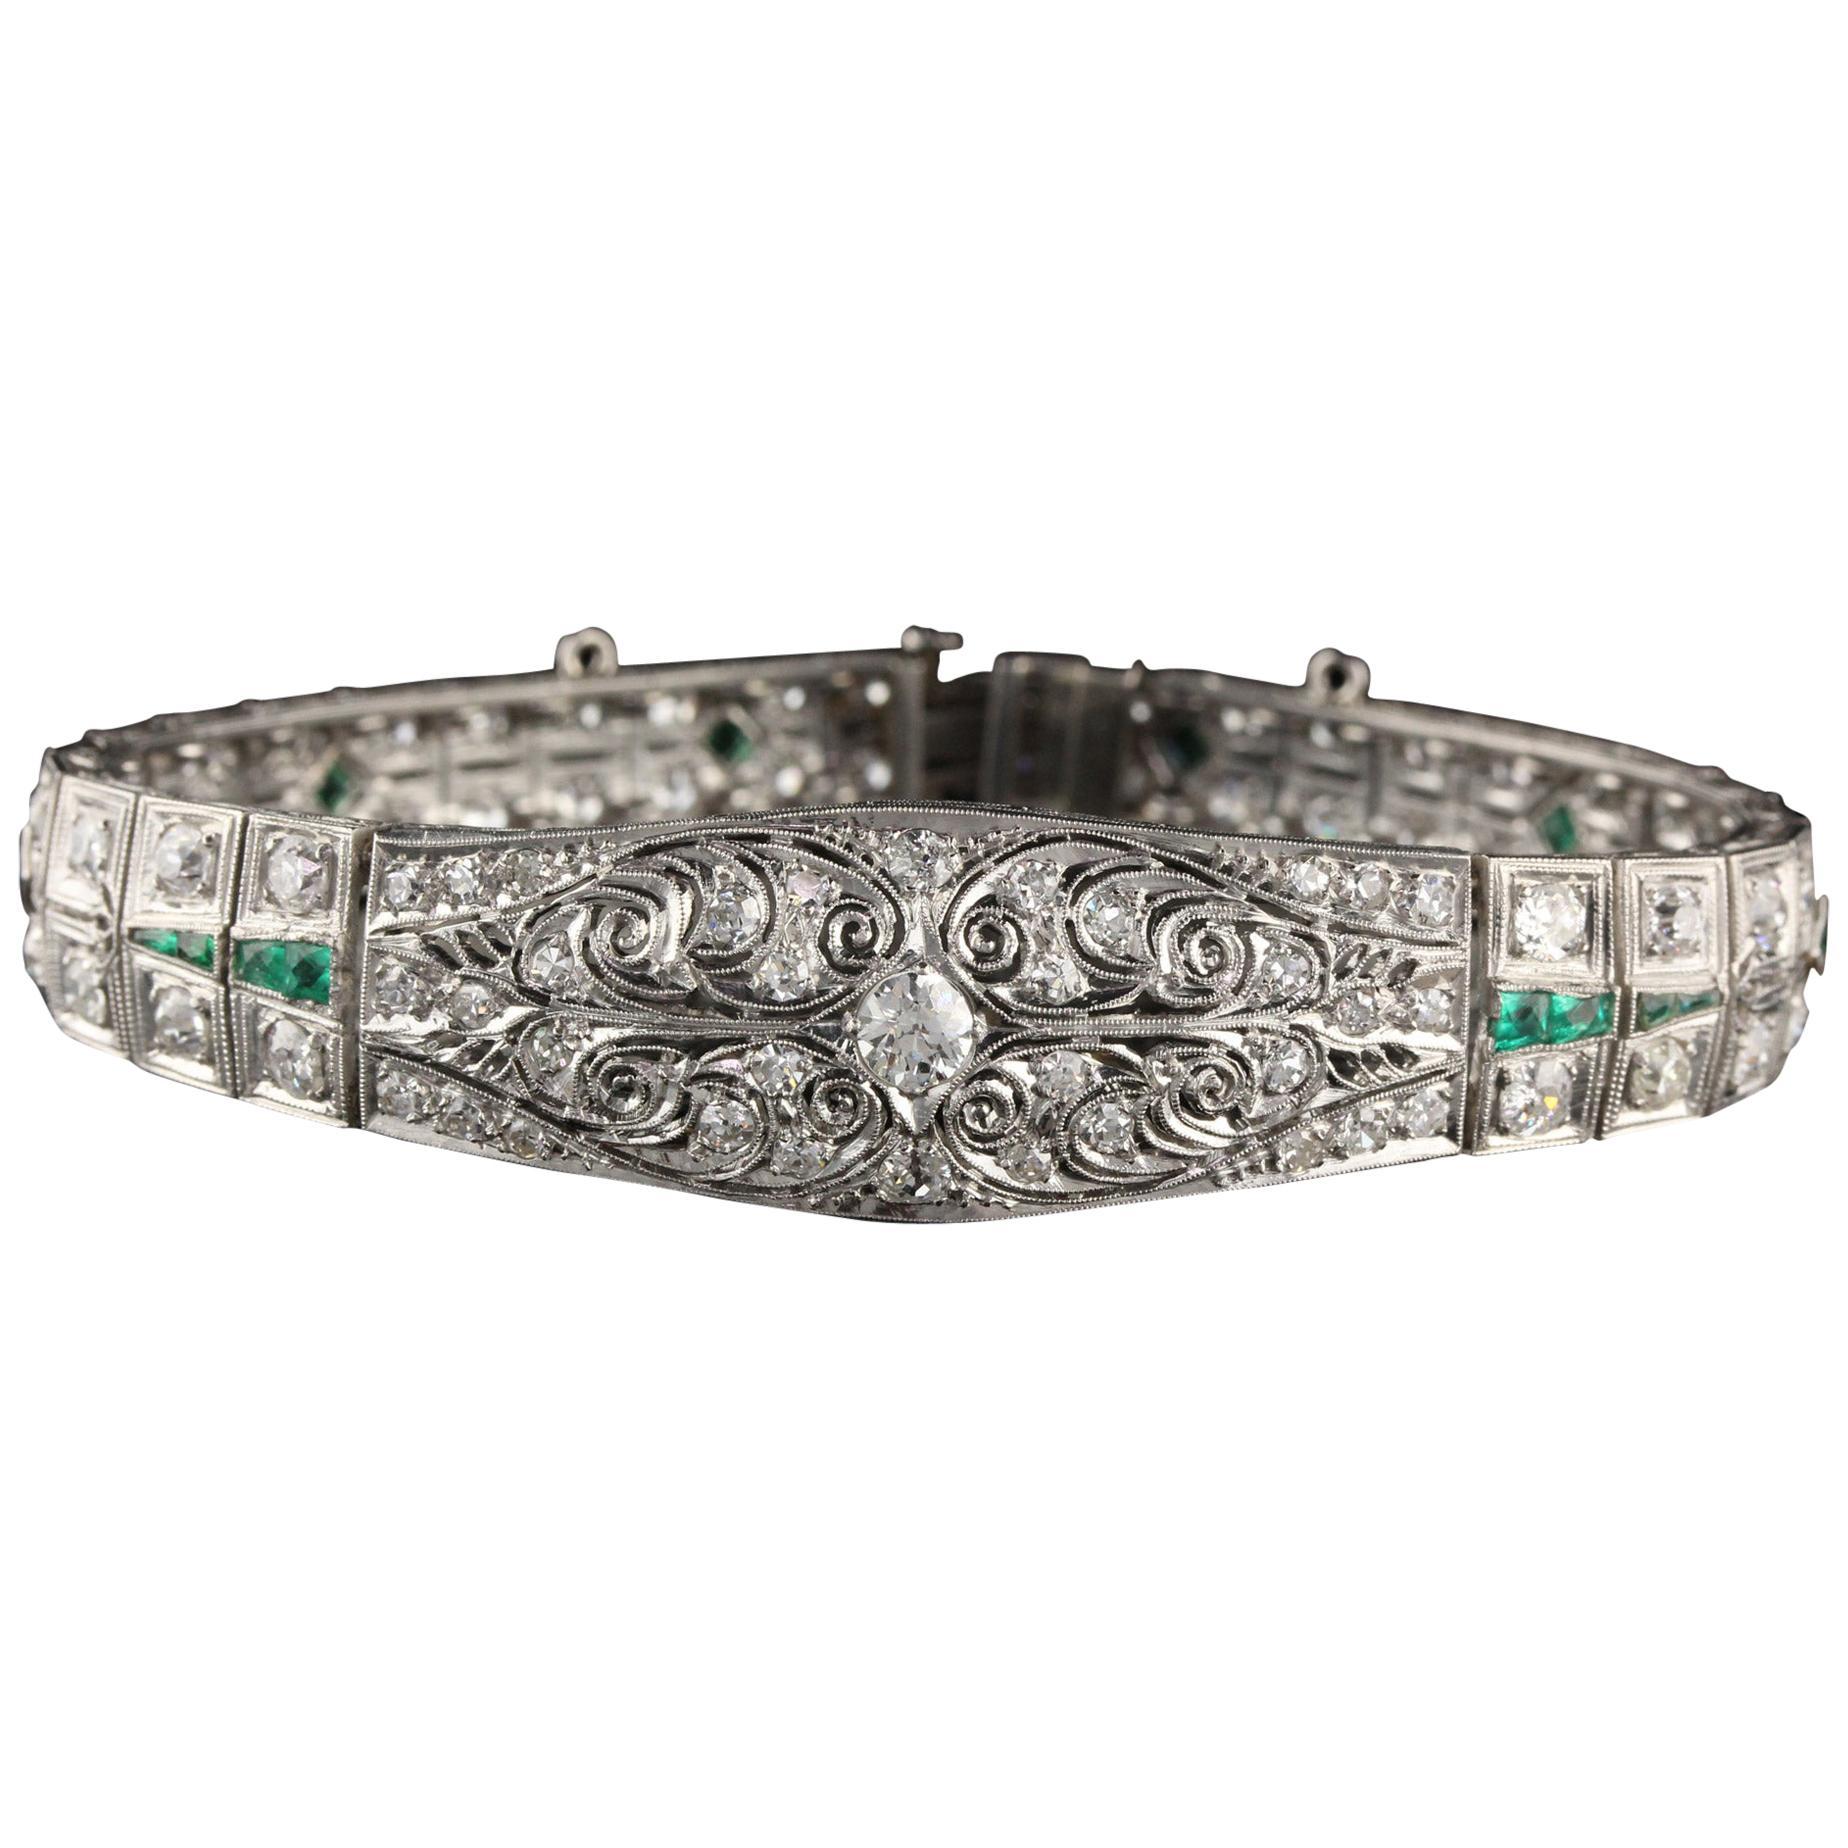 Antique Art Deco Platinum Old Euro Cut Diamond and Emerald Bracelet